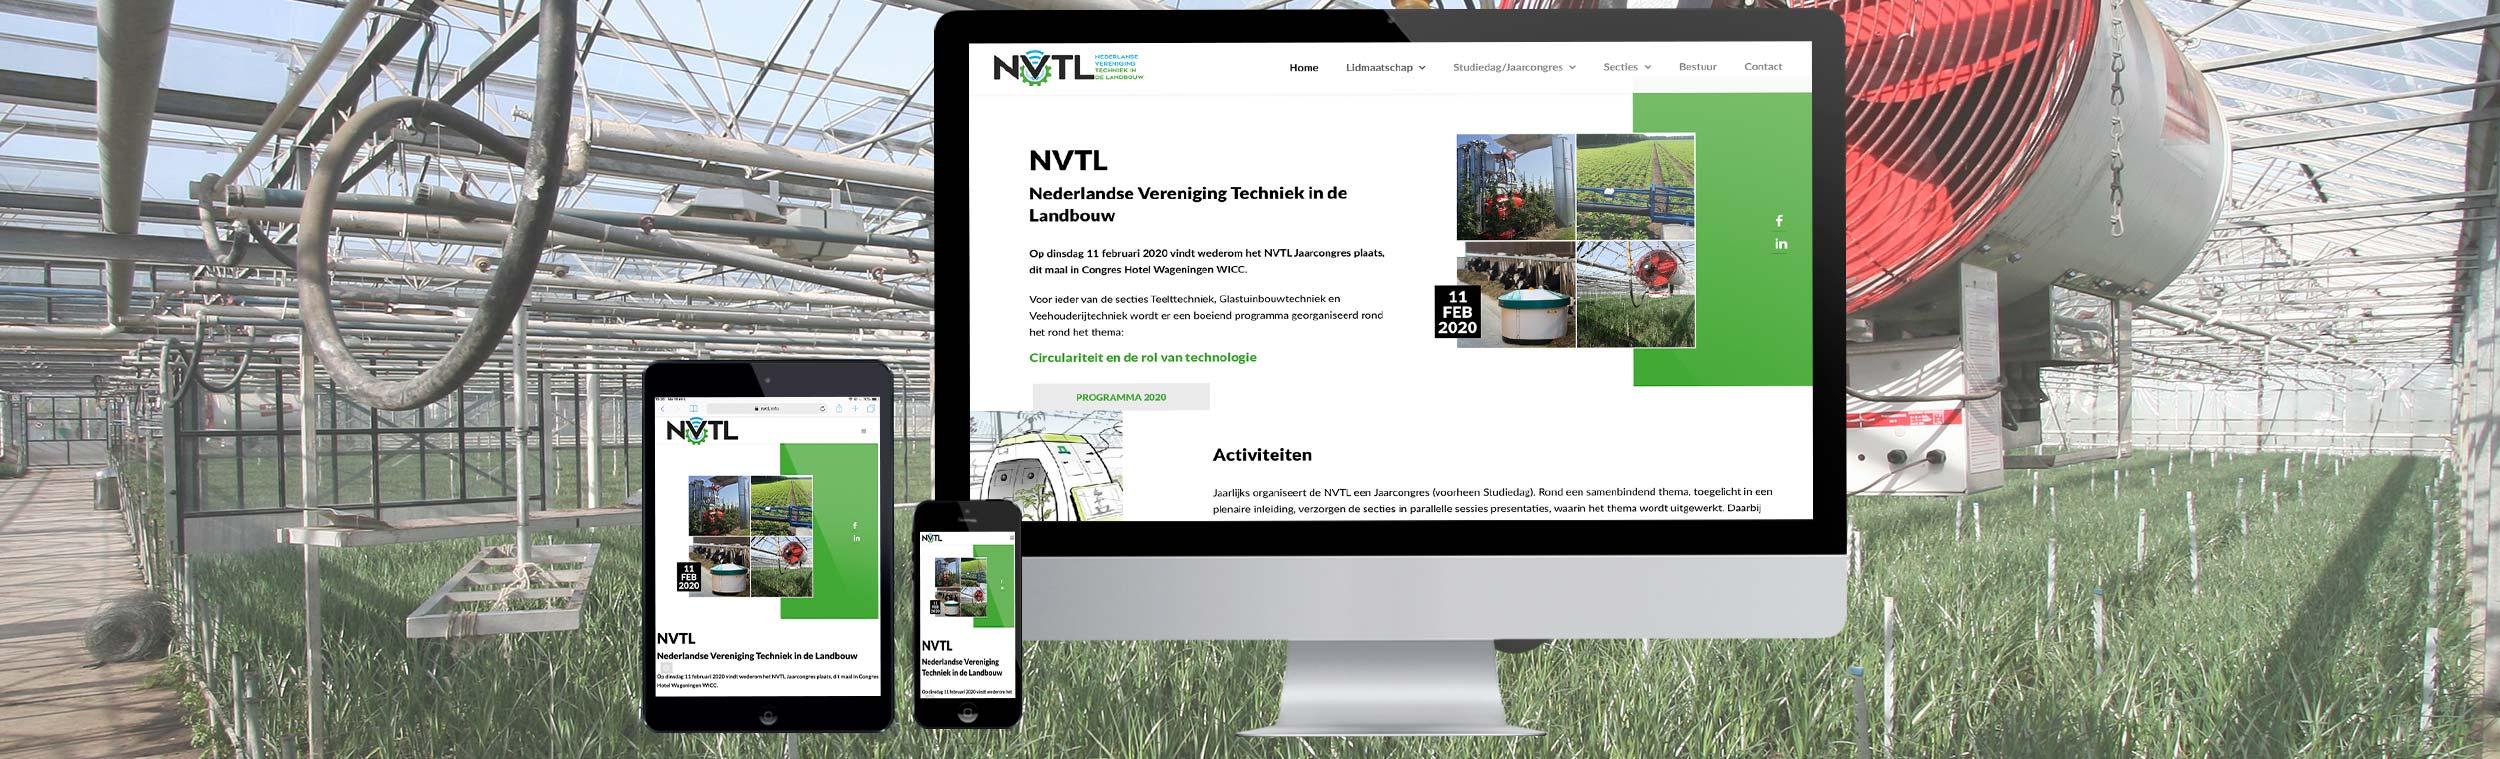 NVTL_banner